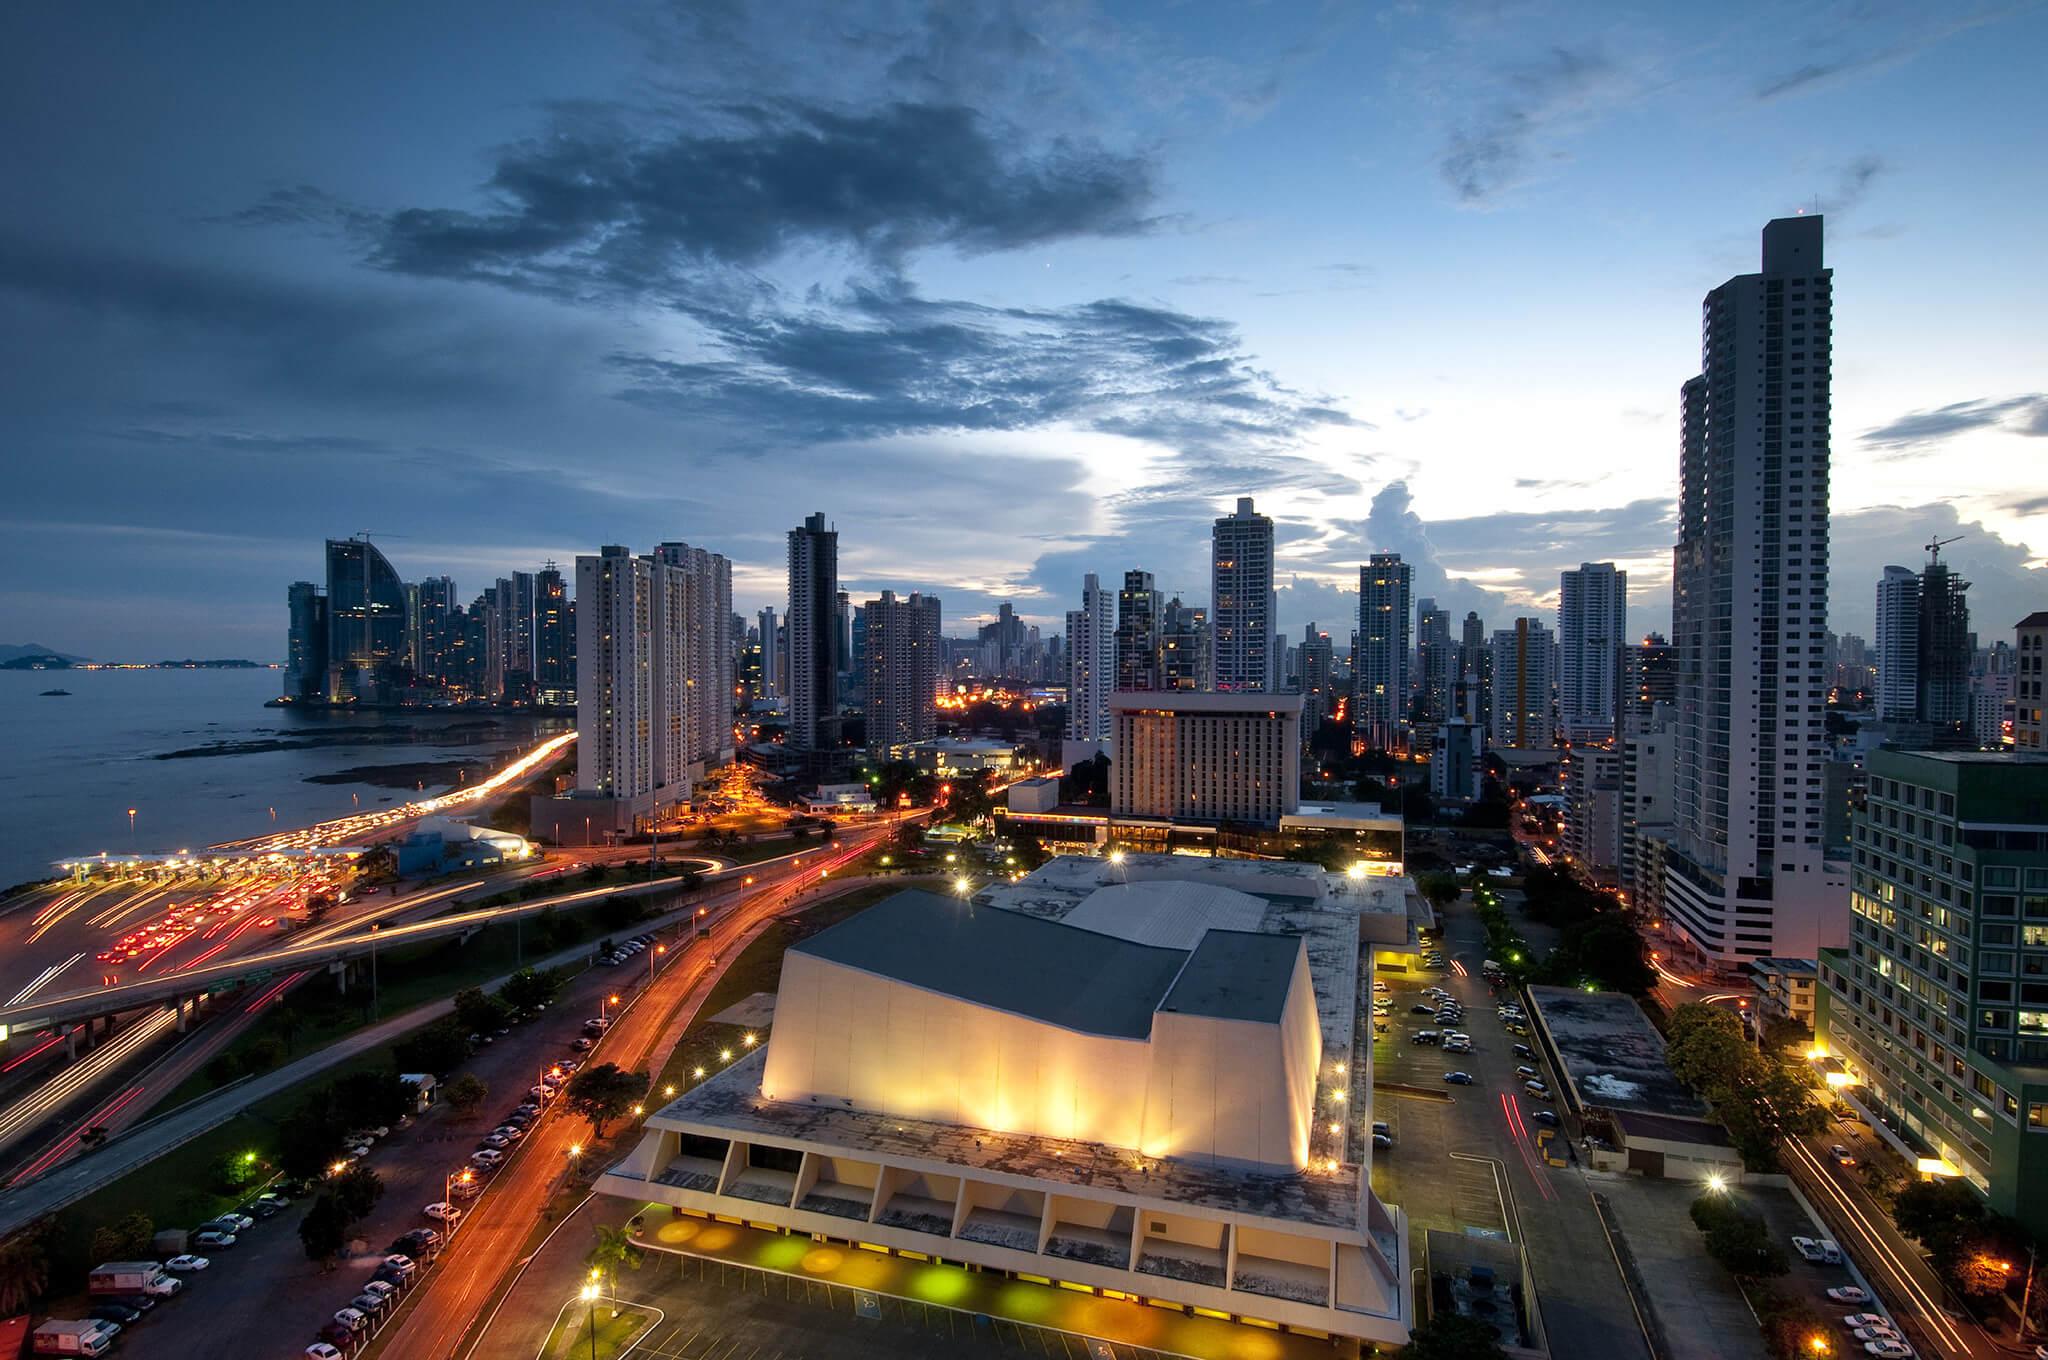 Hilton Hotel Panama City Panama